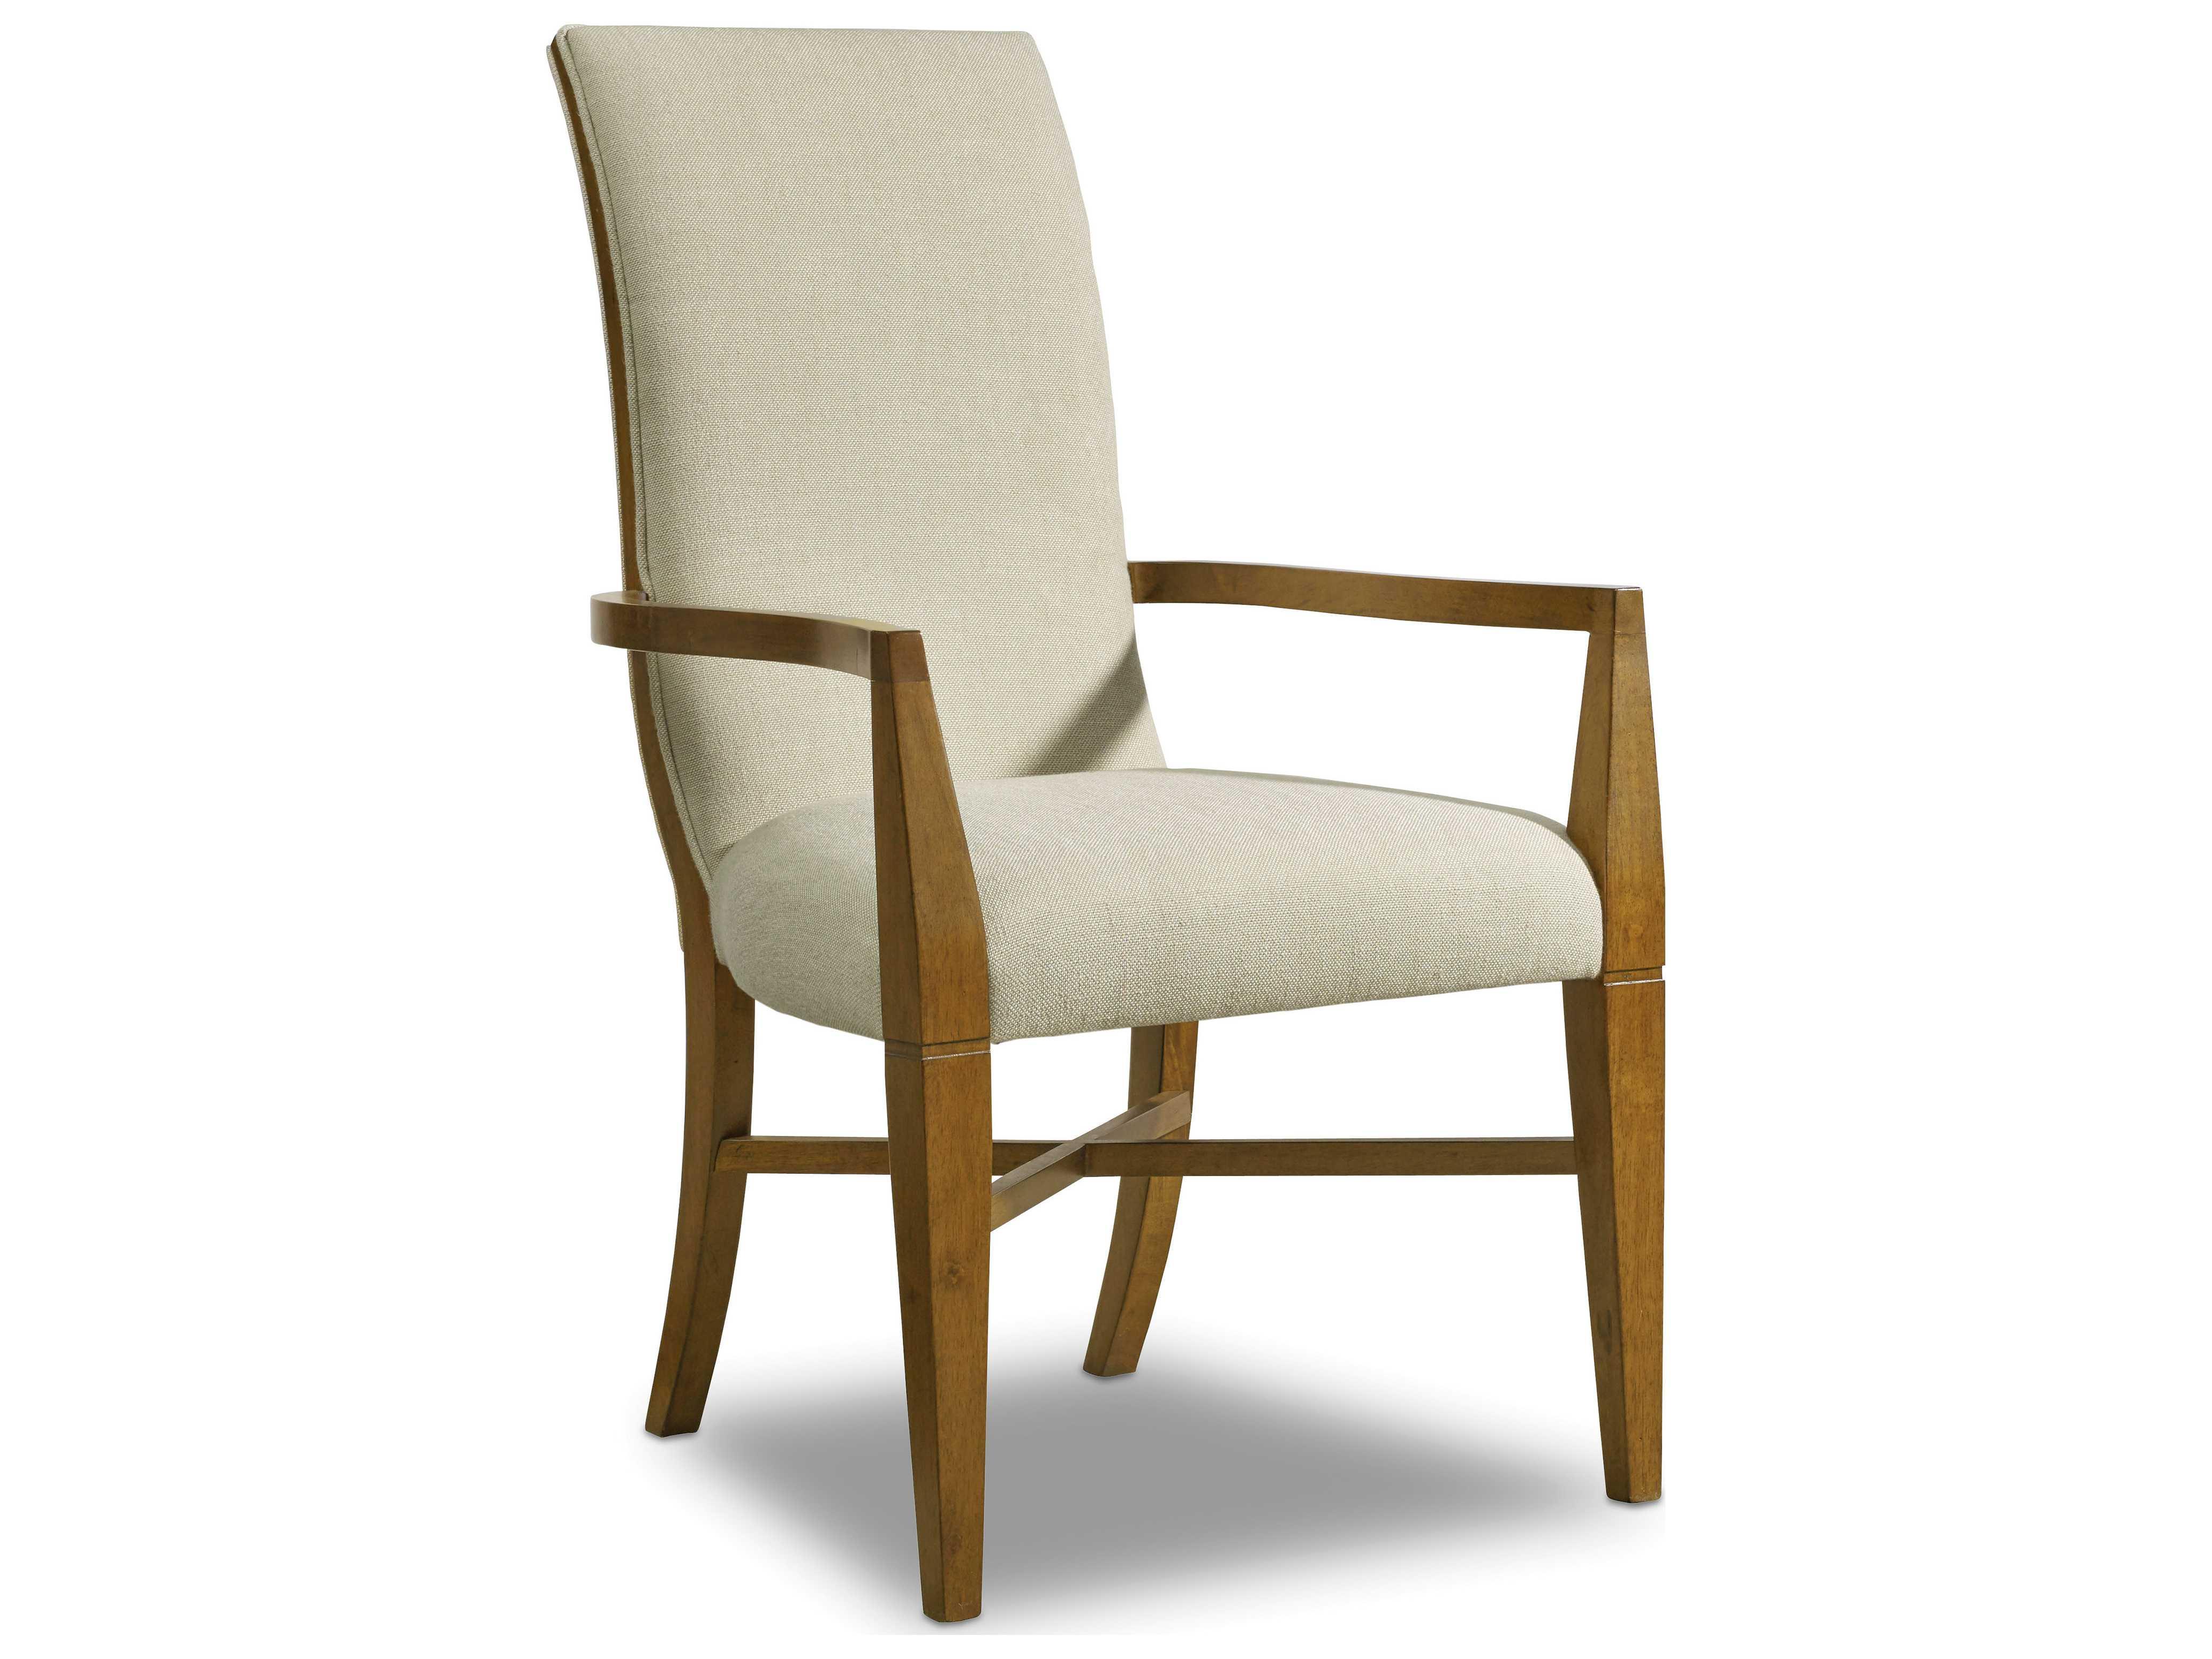 Hooker Furniture Retropolitan Soft Caramel Dining Arm